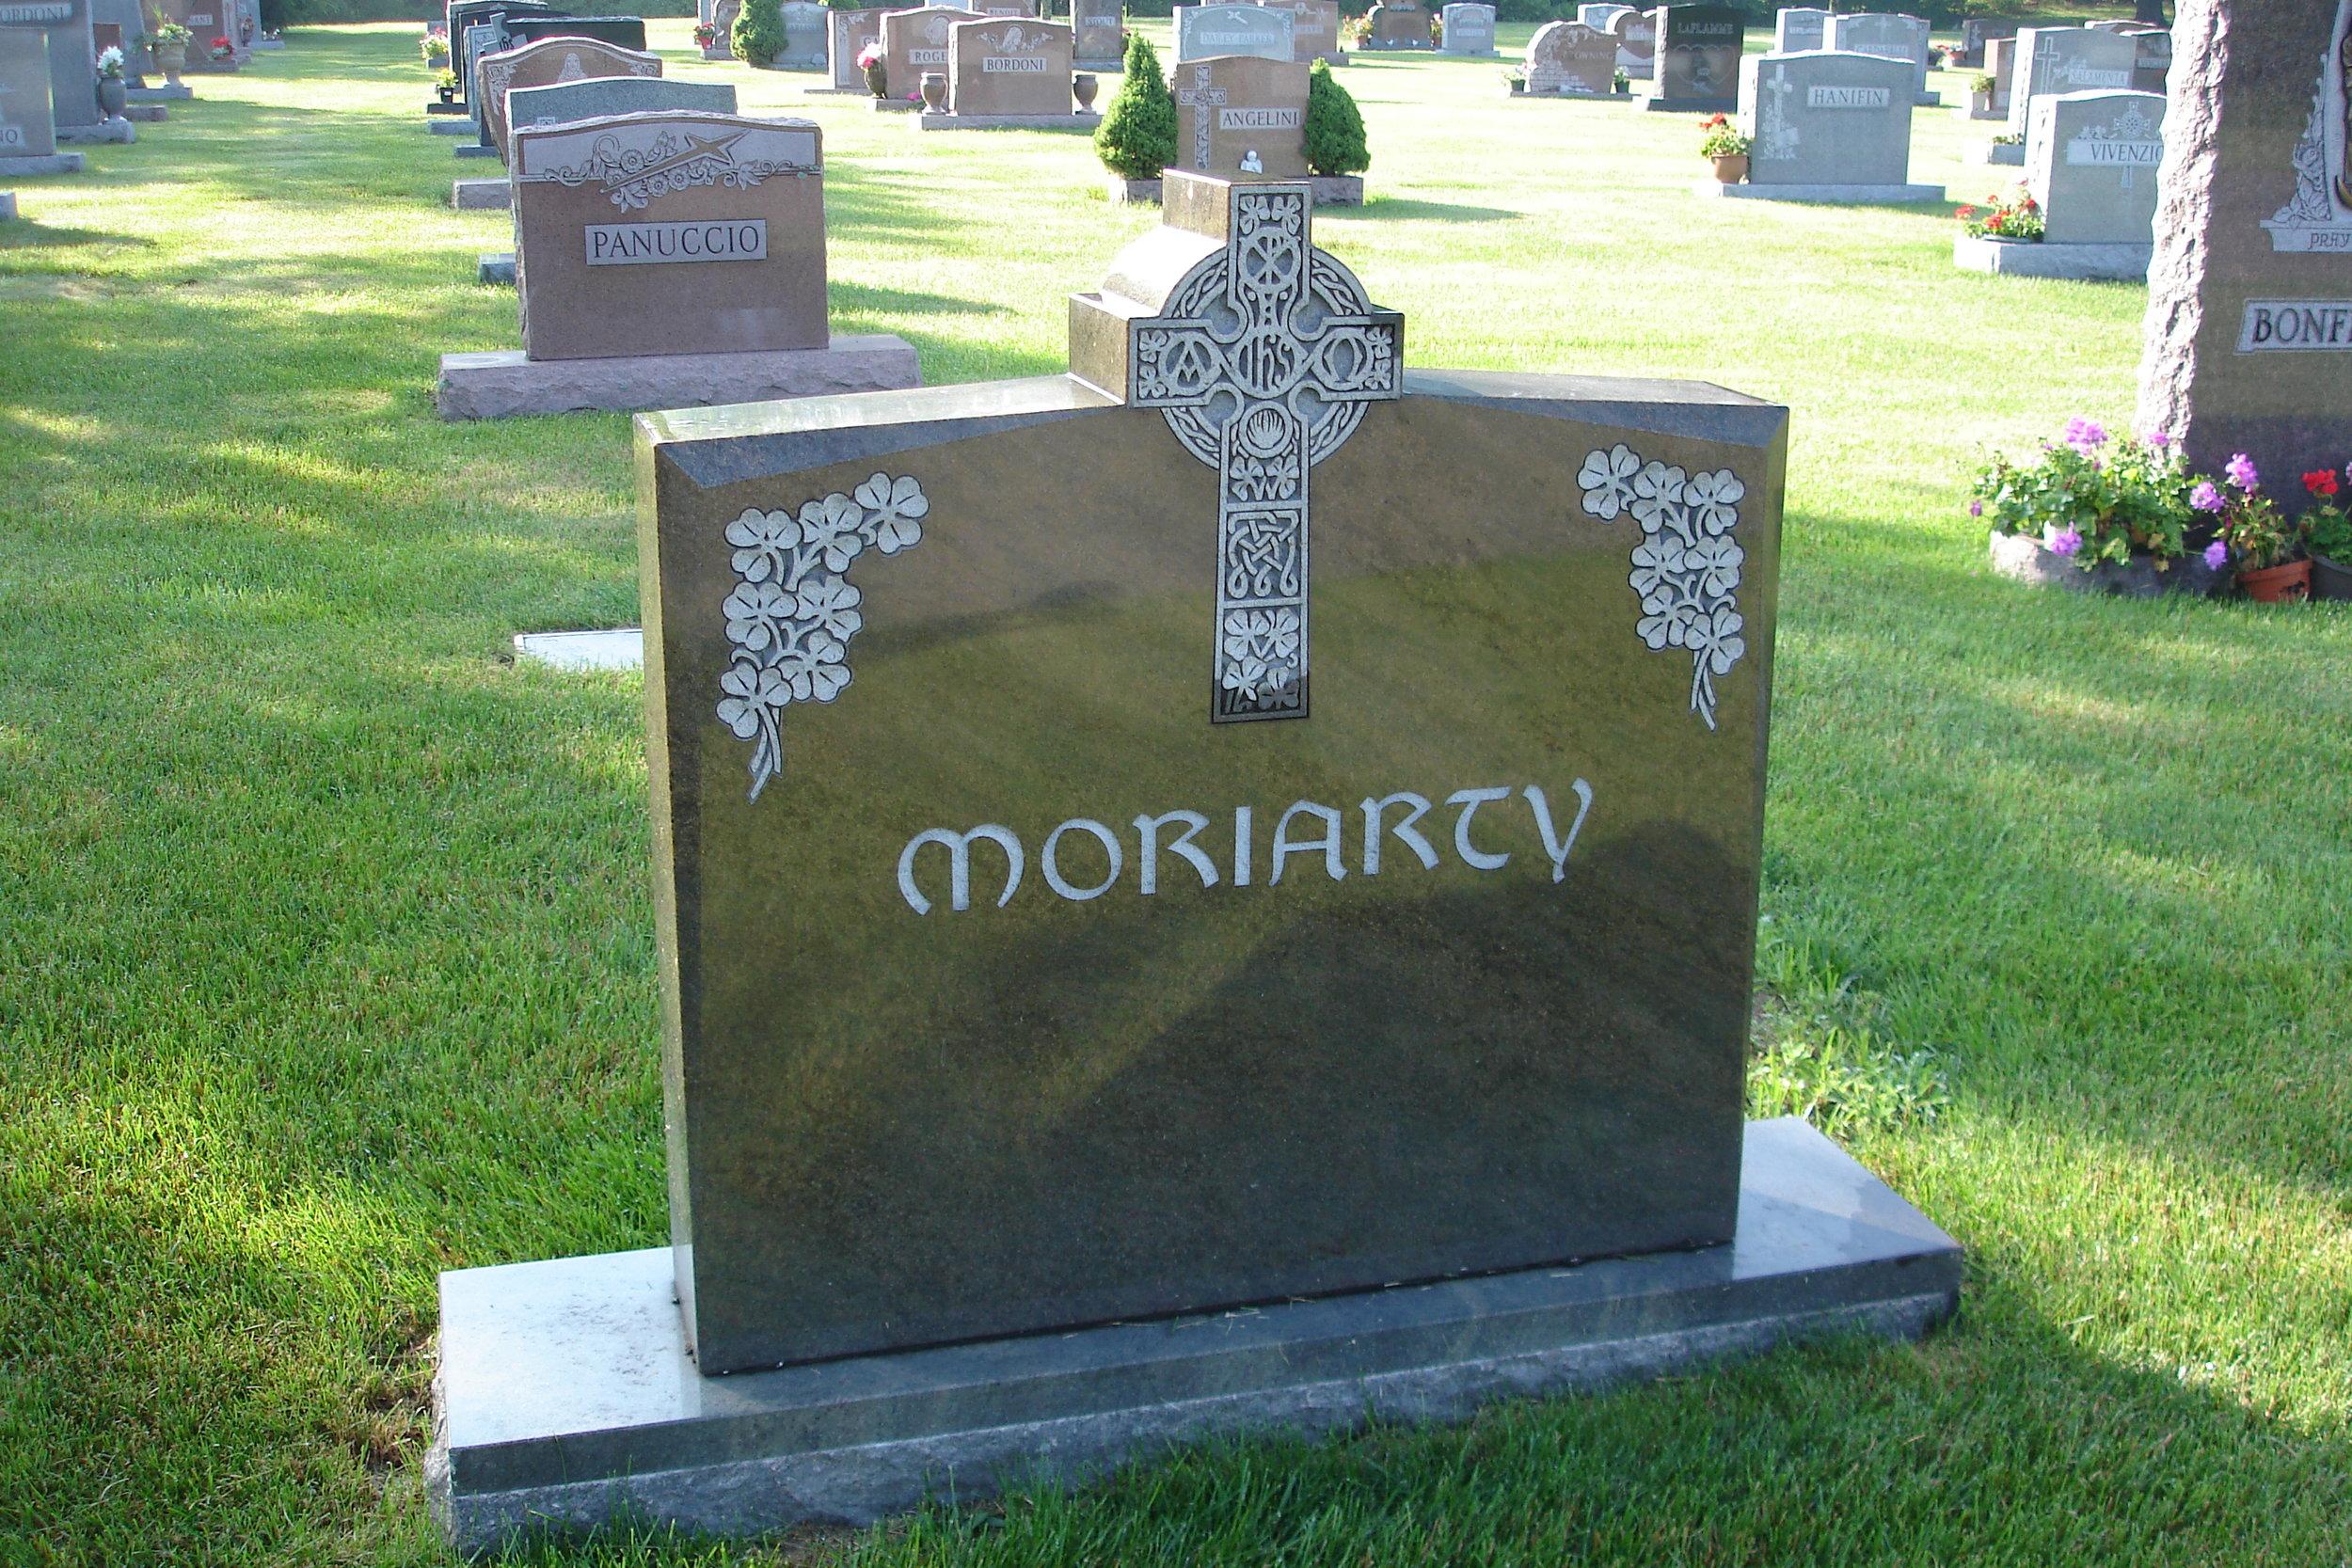 Moriarty 001.jpg